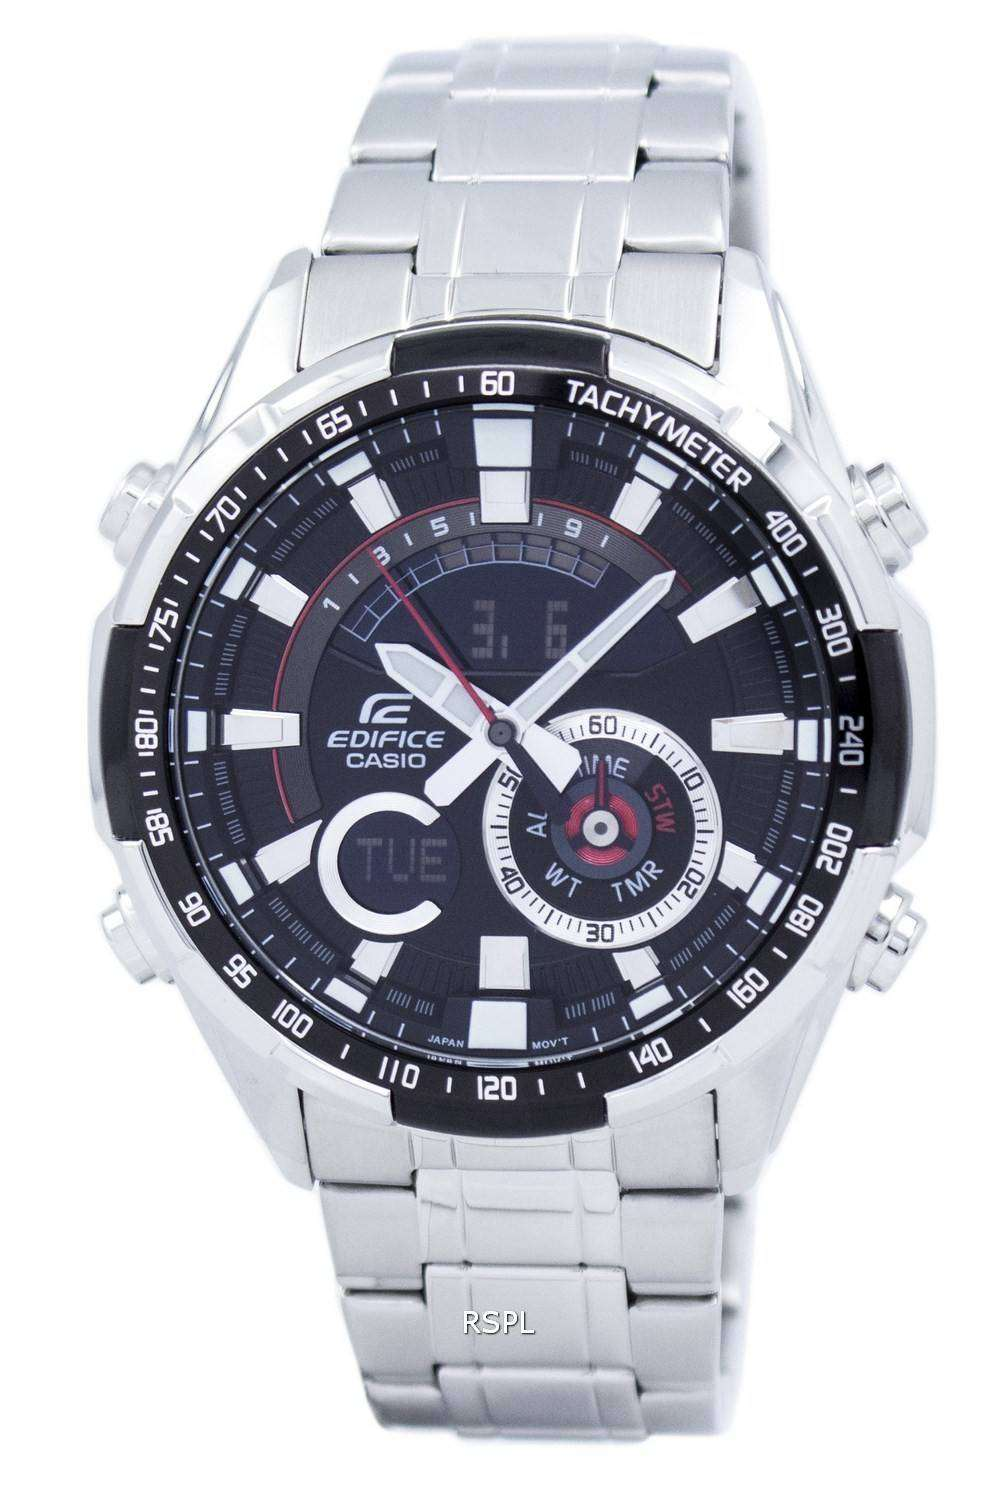 9f4444b15b50 Casio Edifice Chronograph Analog Digital ERA-600D-1AV ERA600D-1AV Men s  Watch